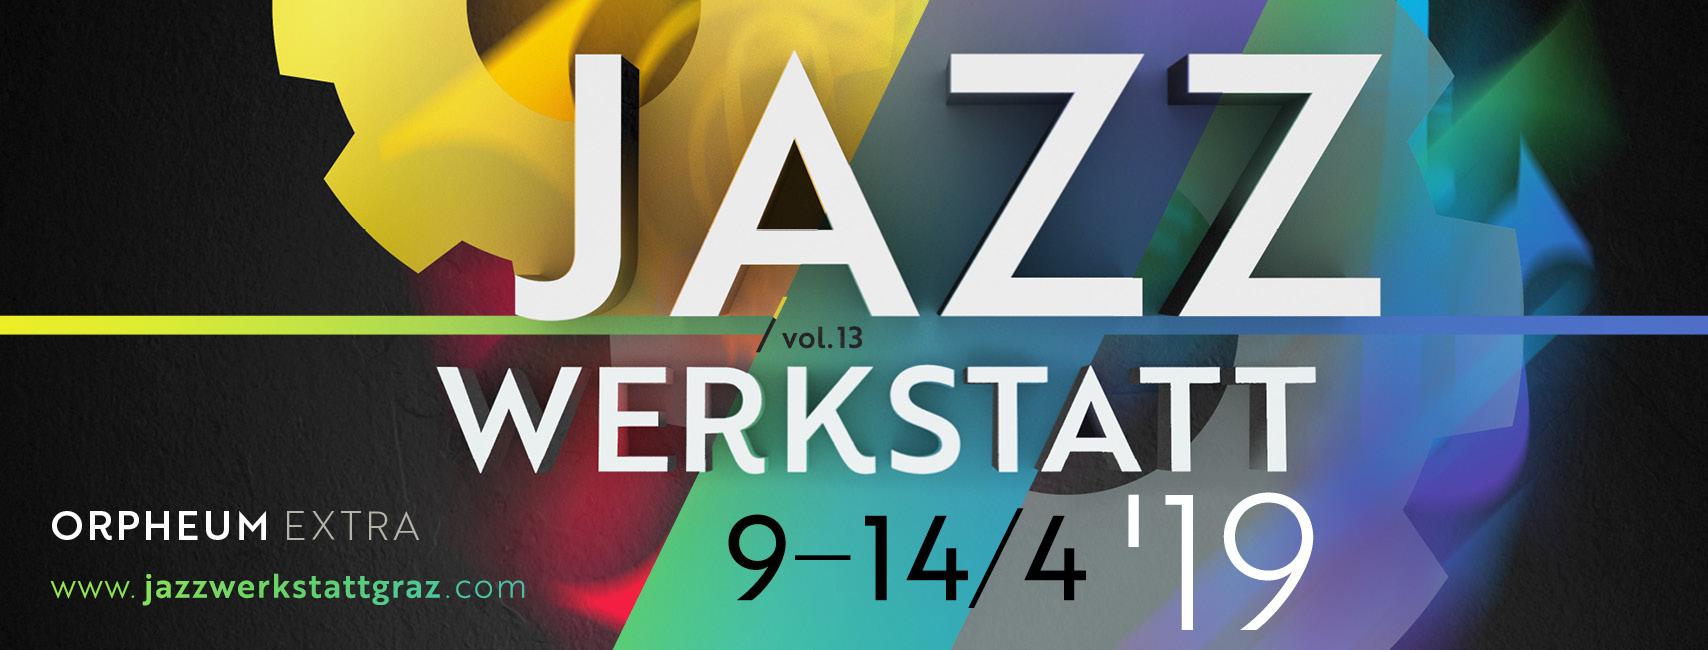 Jazzwerkstatt 2019